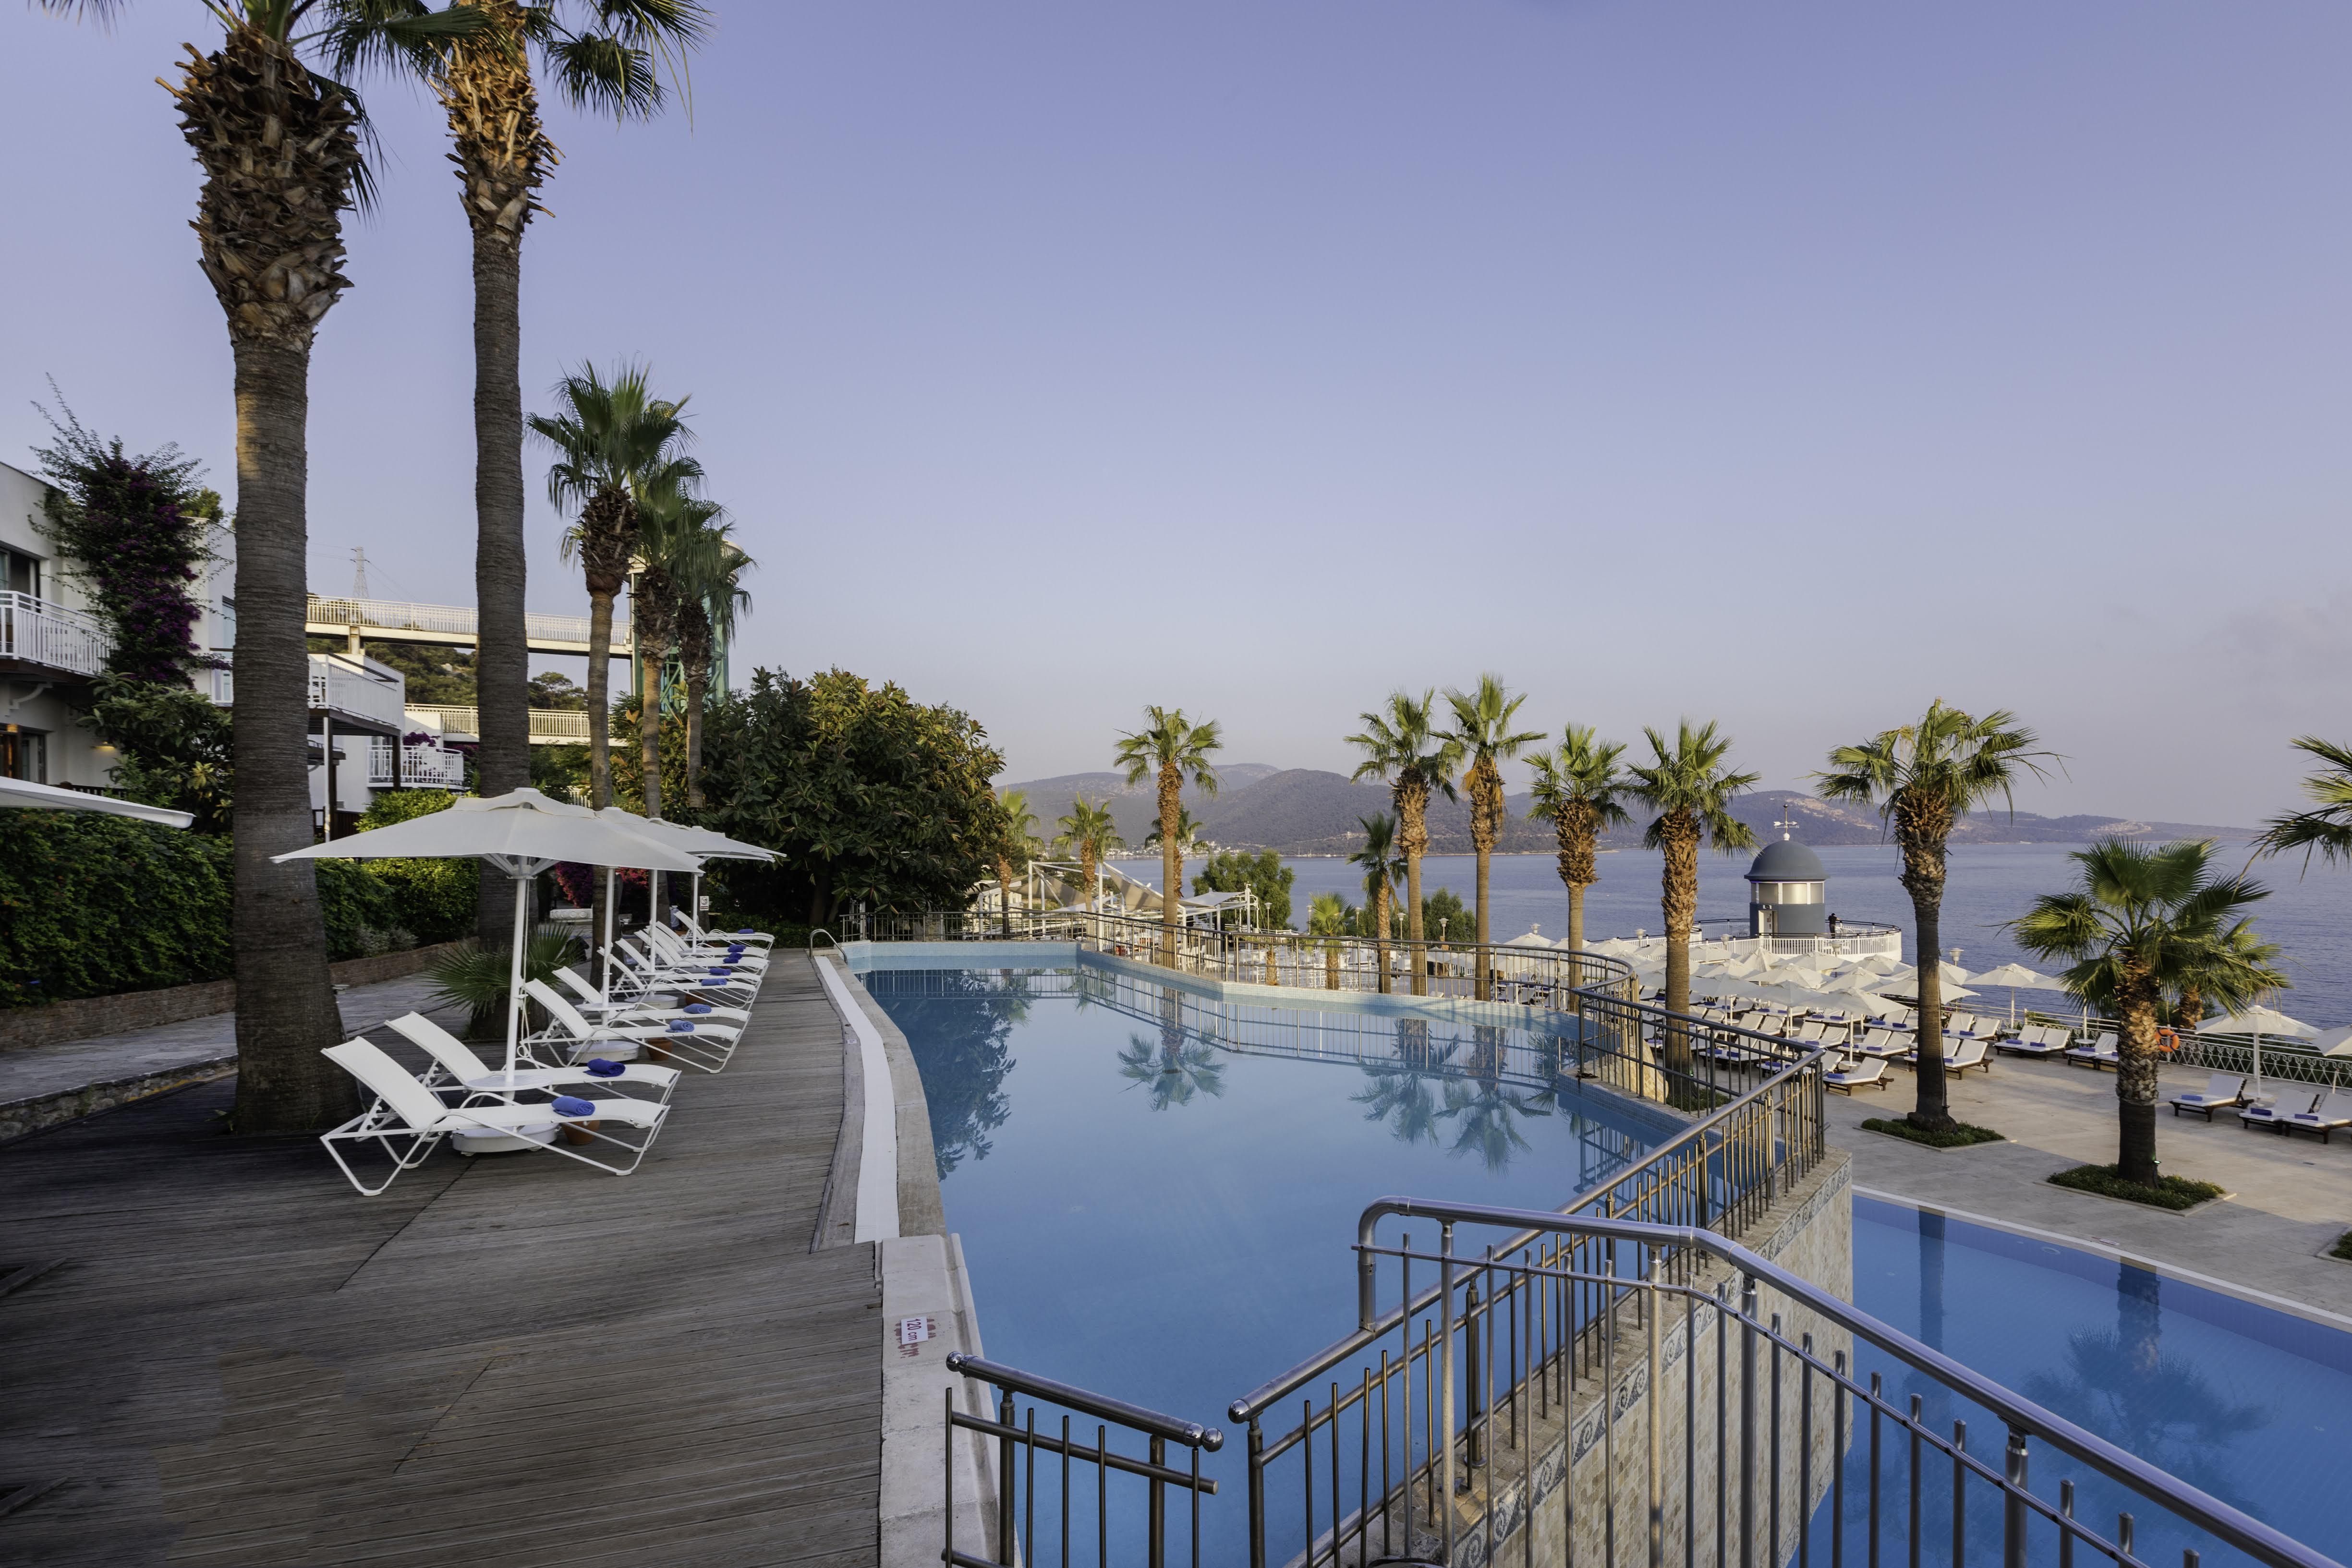 kairaba-blue-dreams-club-hotel-genel-0022